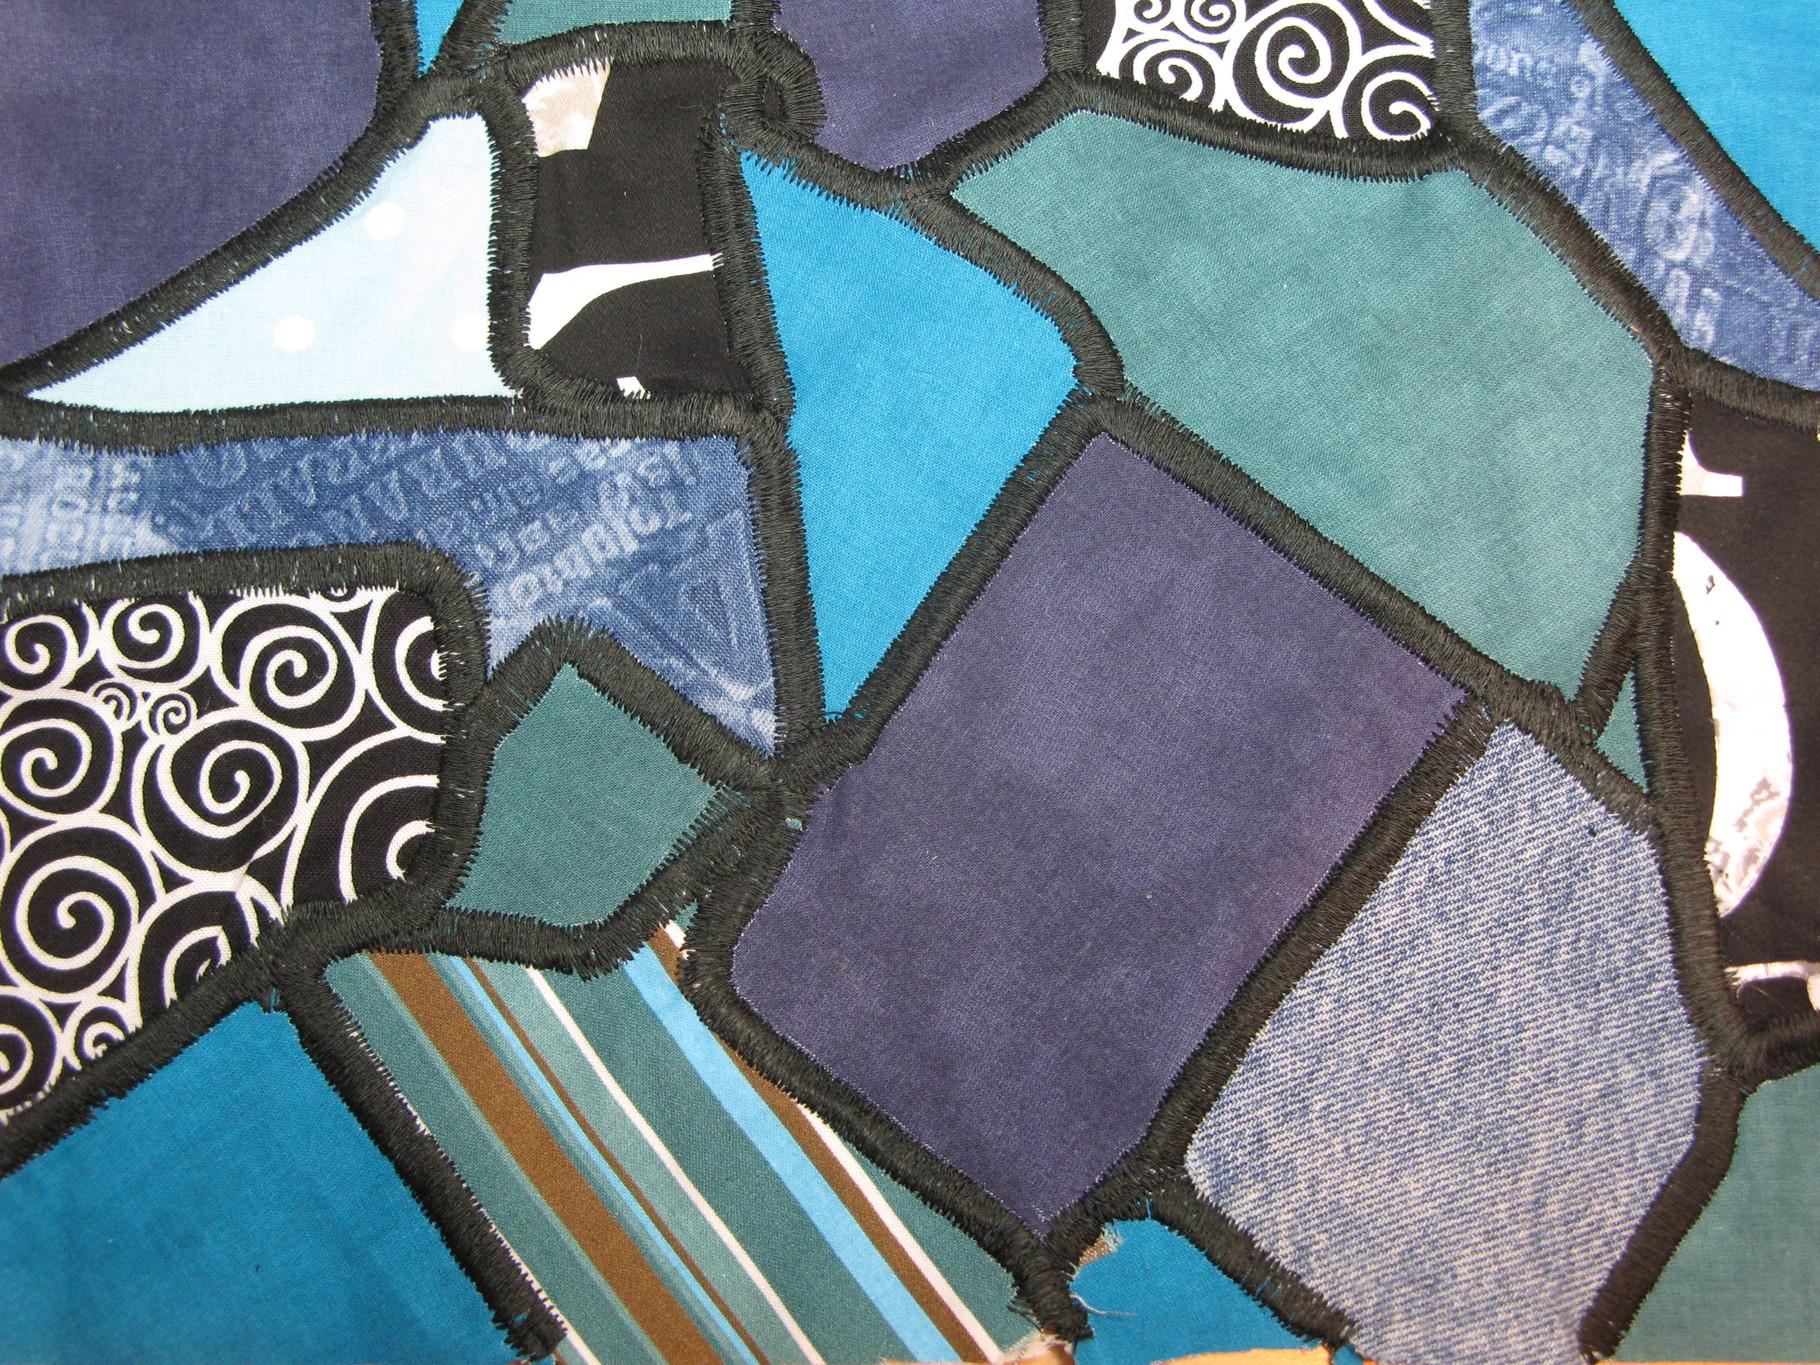 anleitung patchworkmuster mosaik aus stoffresten blog unikationale. Black Bedroom Furniture Sets. Home Design Ideas